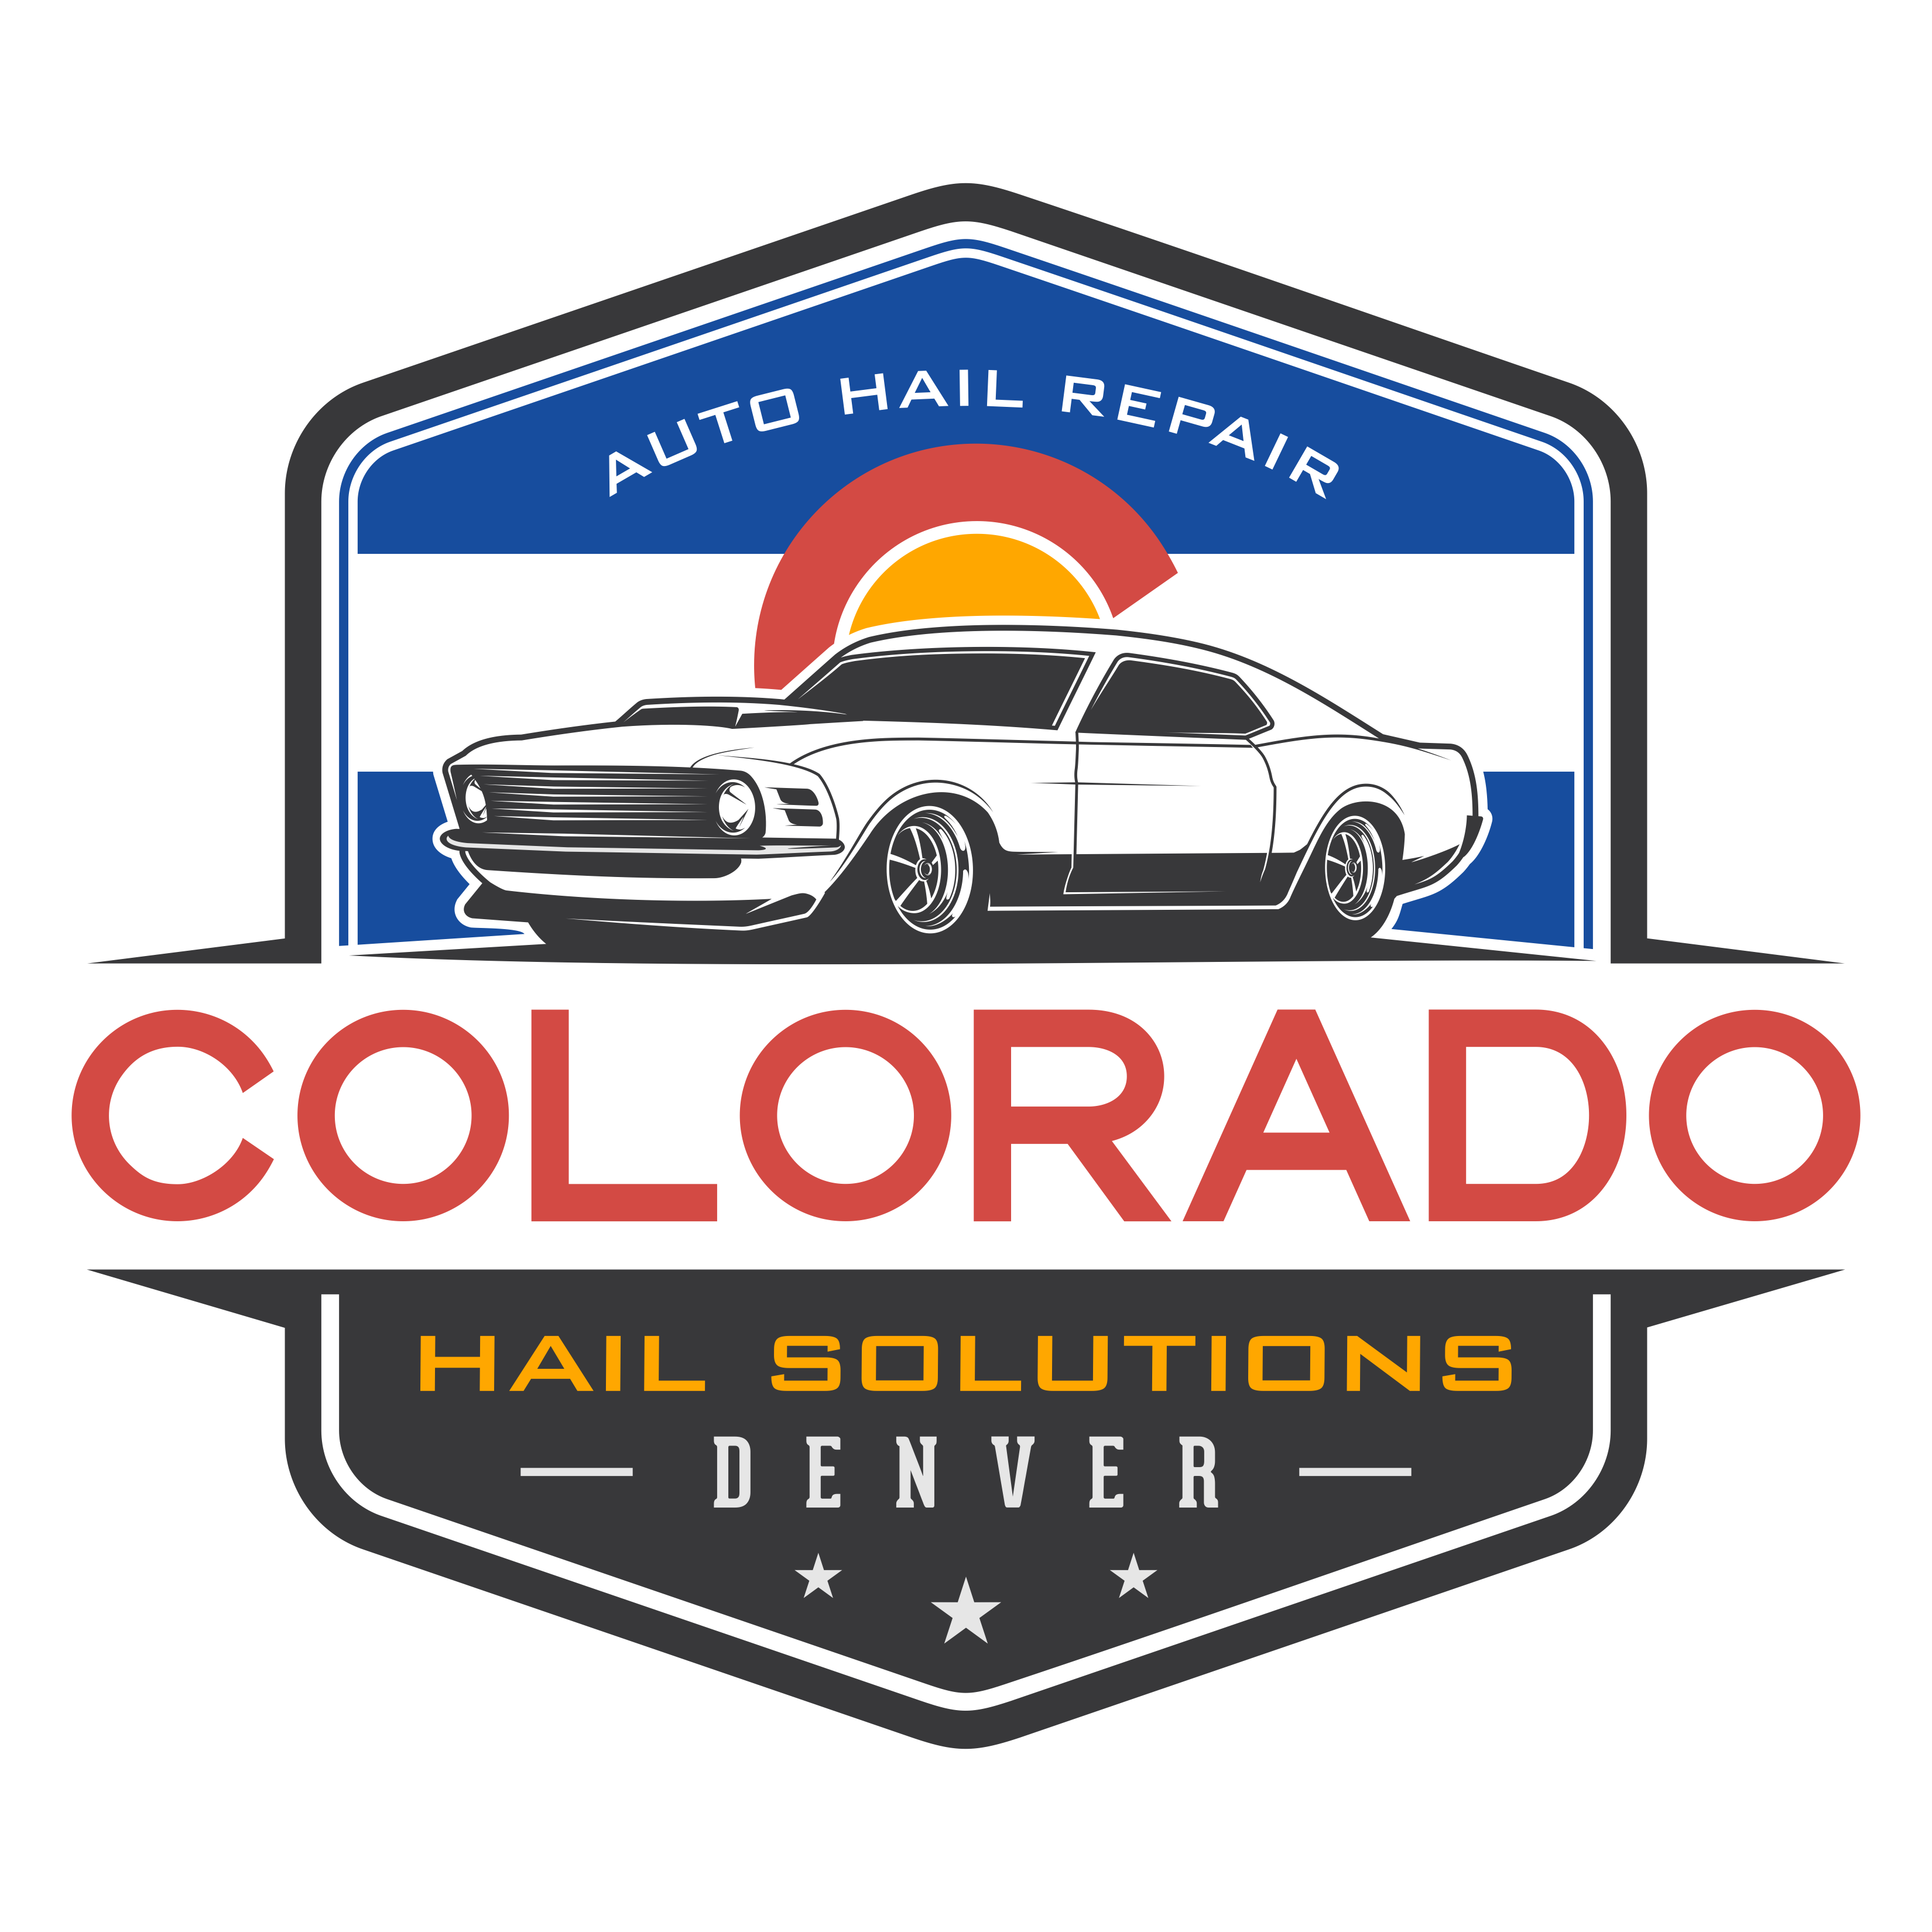 Colorado Hail Solutions